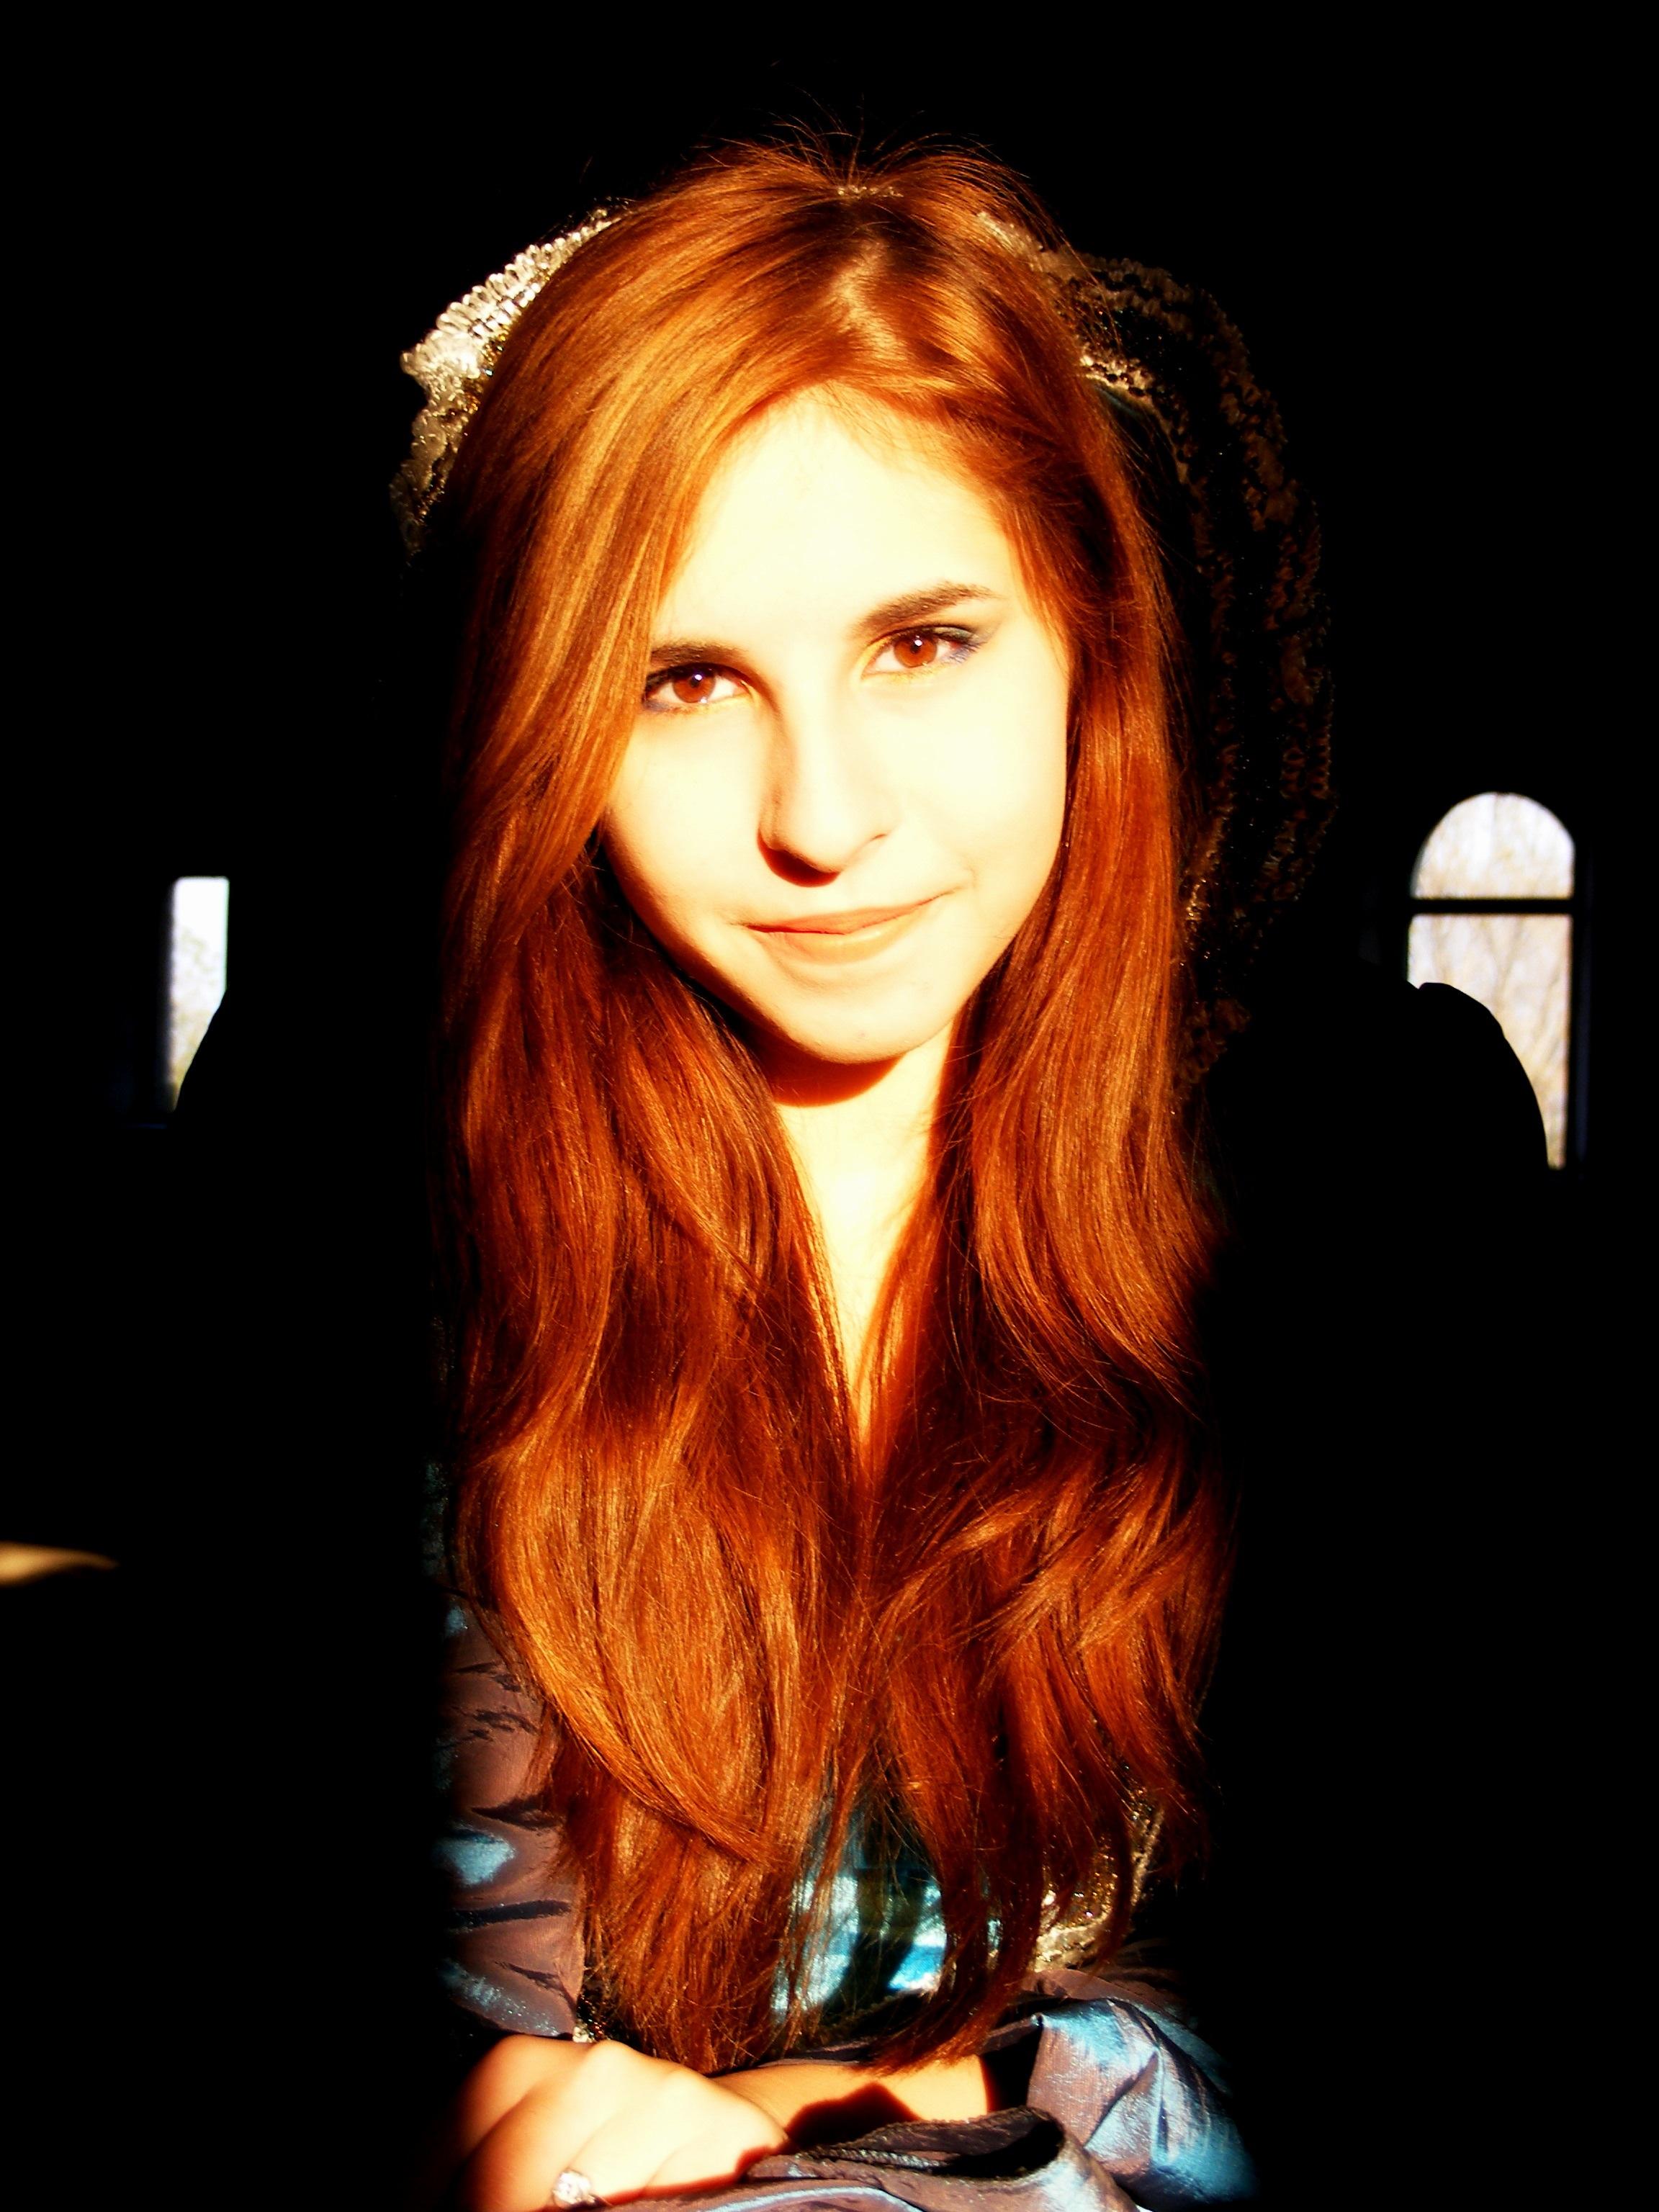 Free Images Light Girl Singer Portrait Model Hairstyle Long